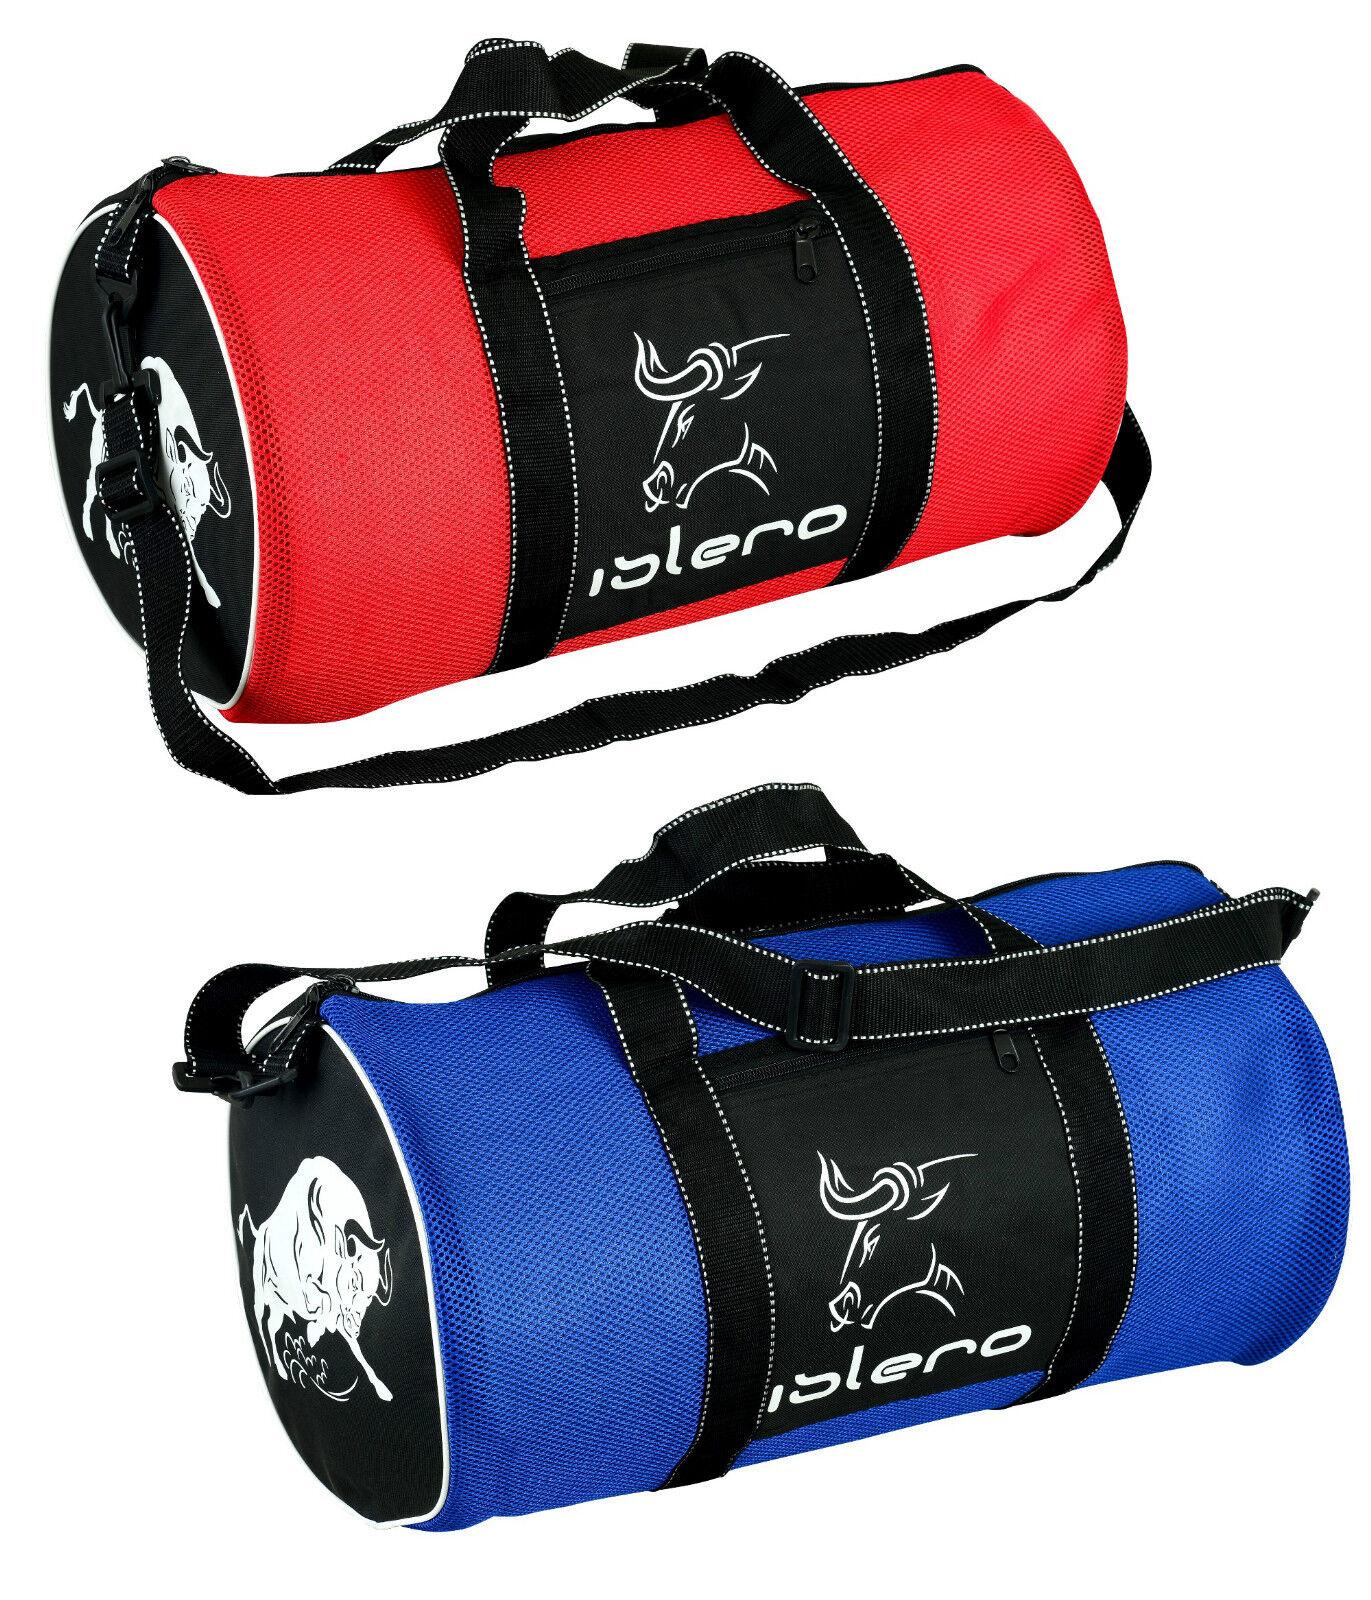 Gym Bag Briefcase: EVO GYM Sports Kit Bag Backpack Duffle Football Fitness